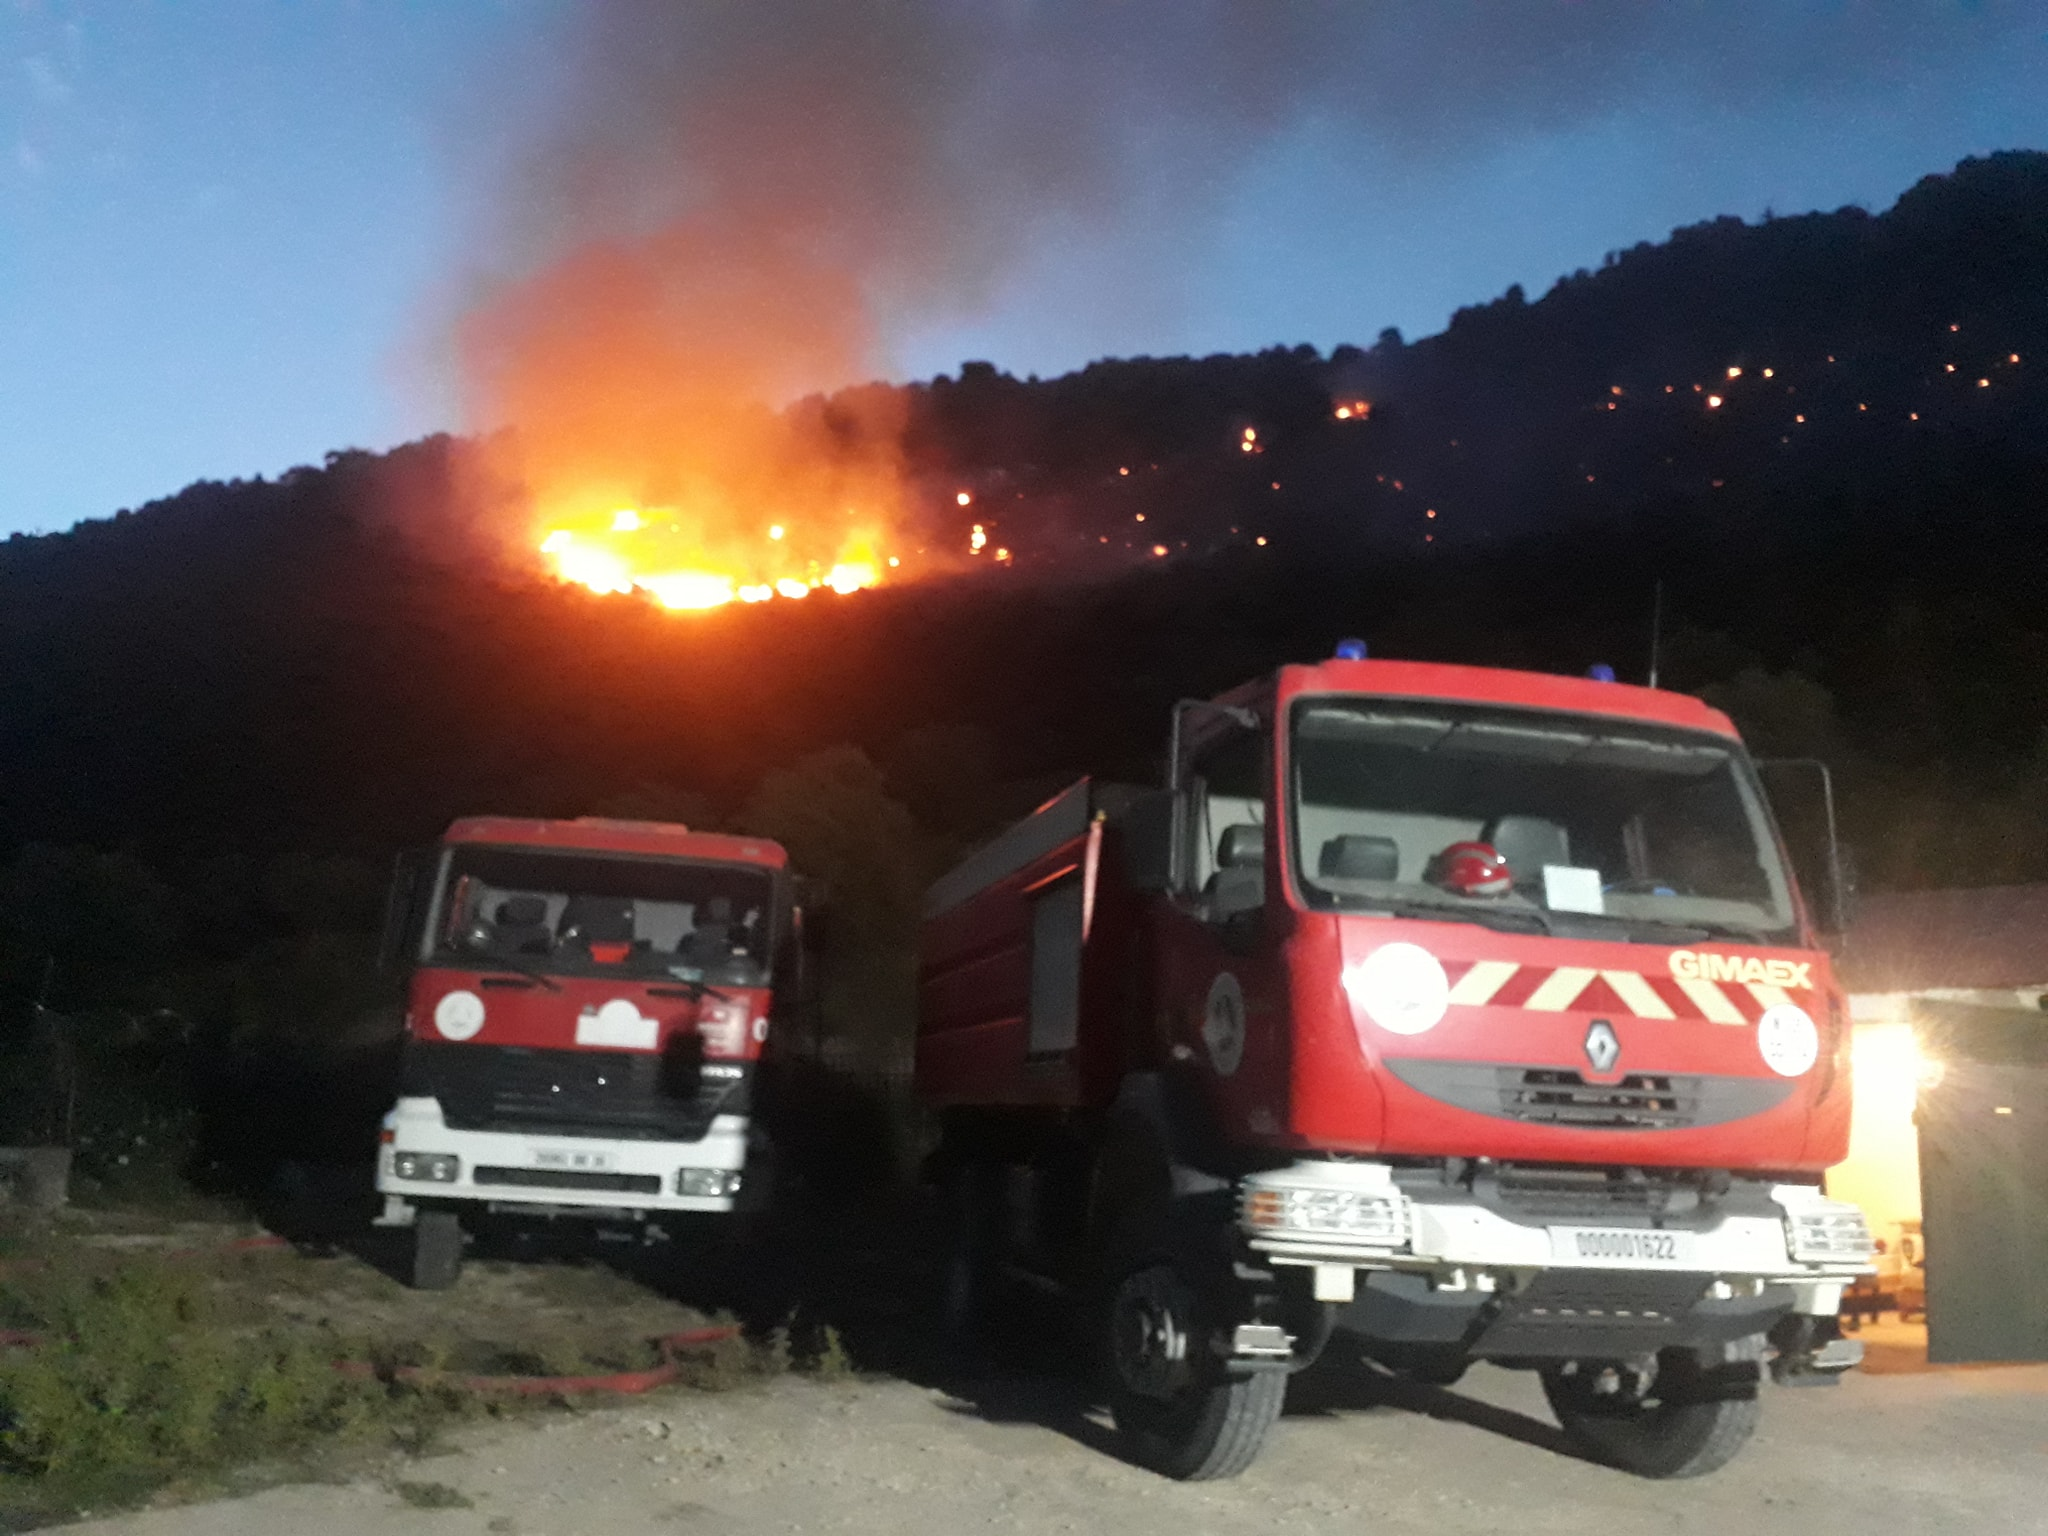 حرائق بـ 7 ولايات وغابات تلتهمها النيران منذ أيام